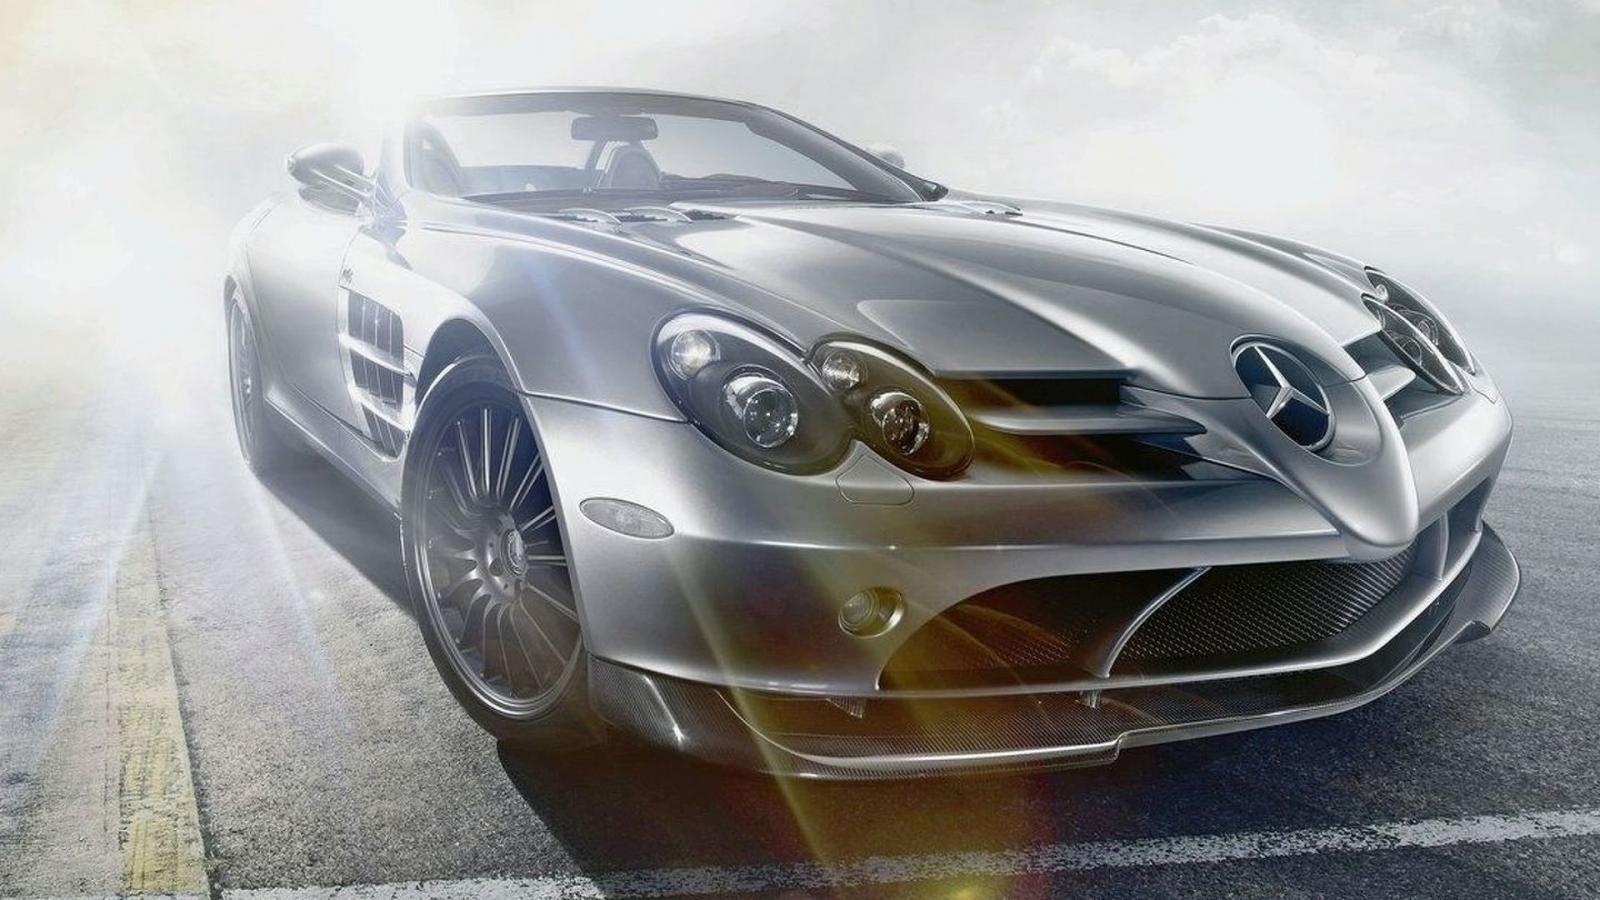 Mercedes Benz SLR Mclaren angular front